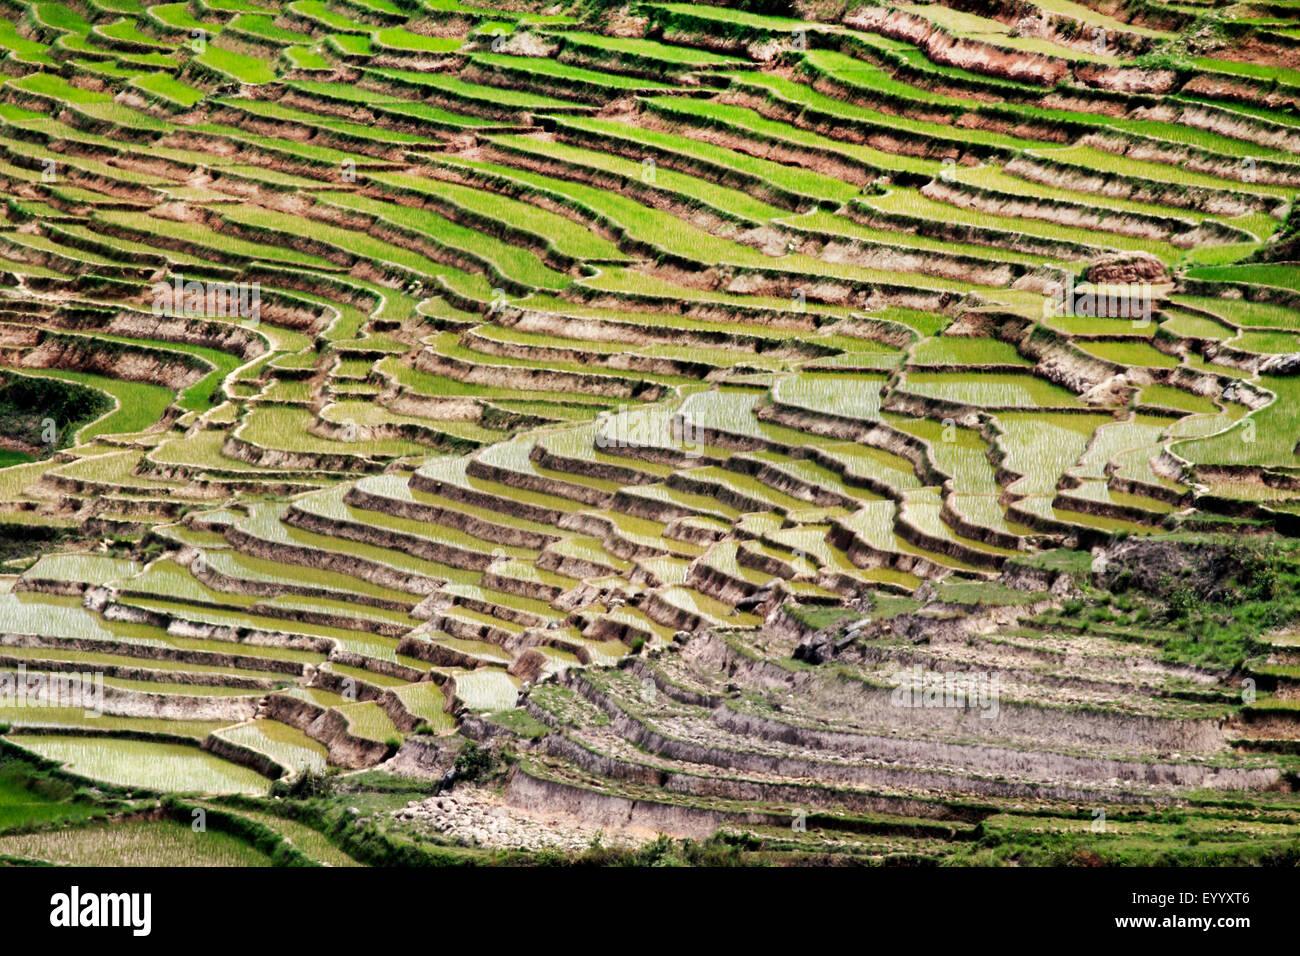 scenery with rice terraces, Madagascar, Fianarantsoa - Stock Image